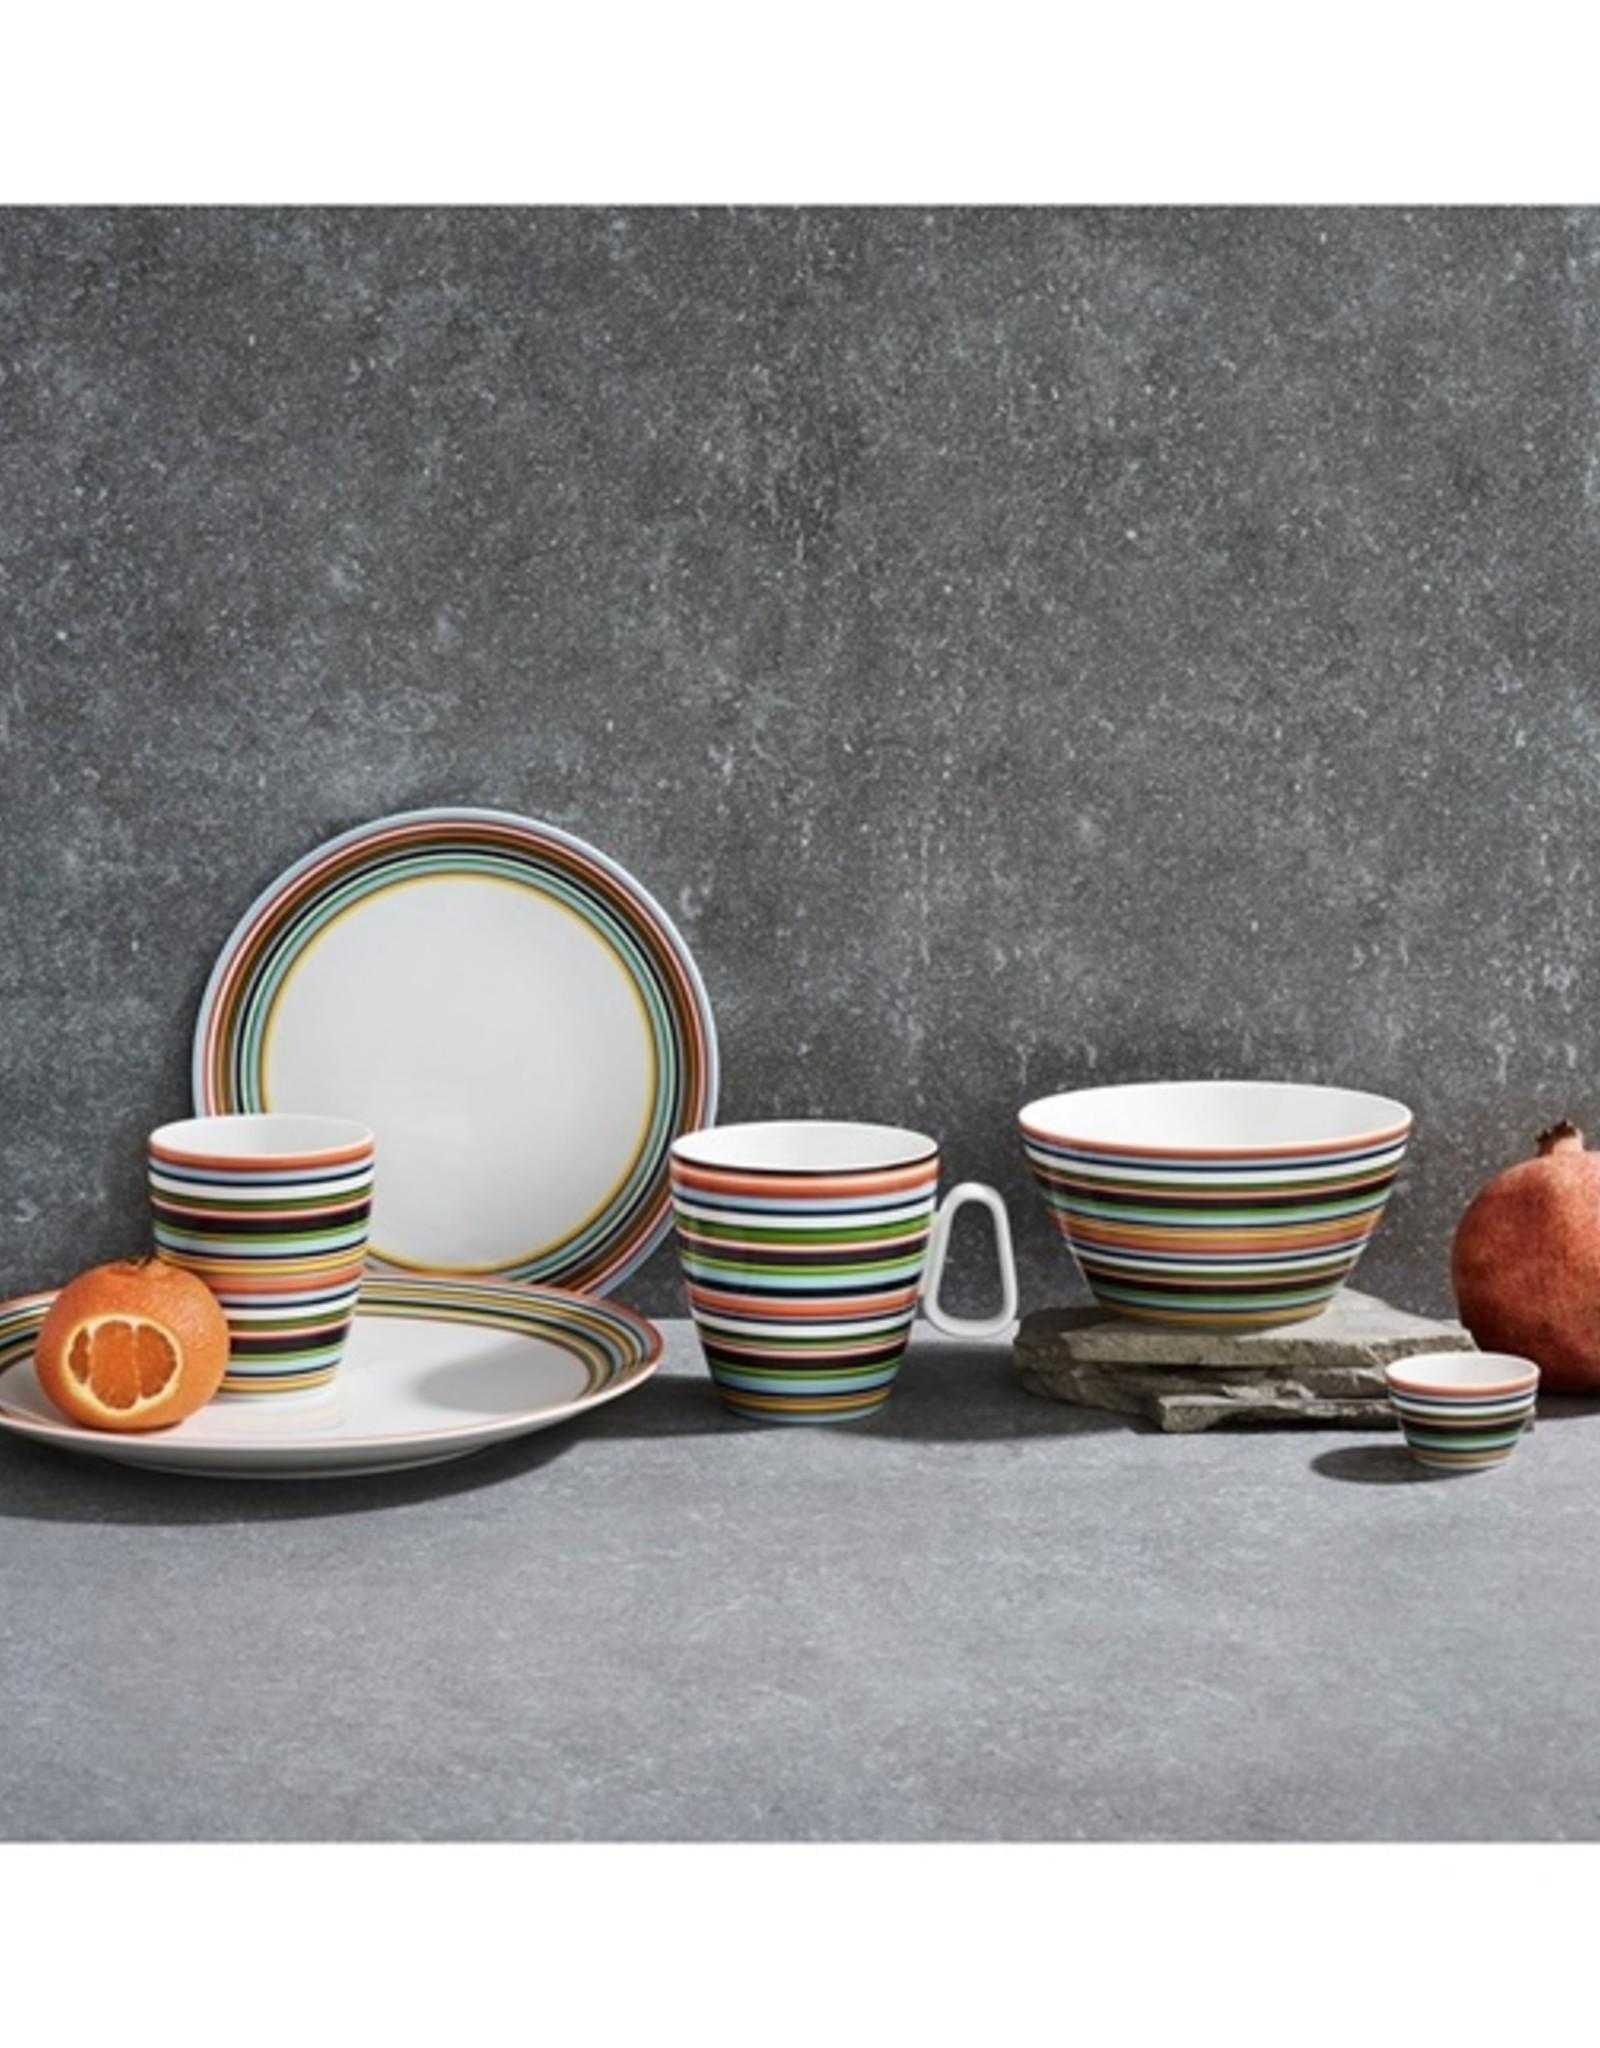 Iittala Iittala Origo Beker - 0,25 l - Oranje